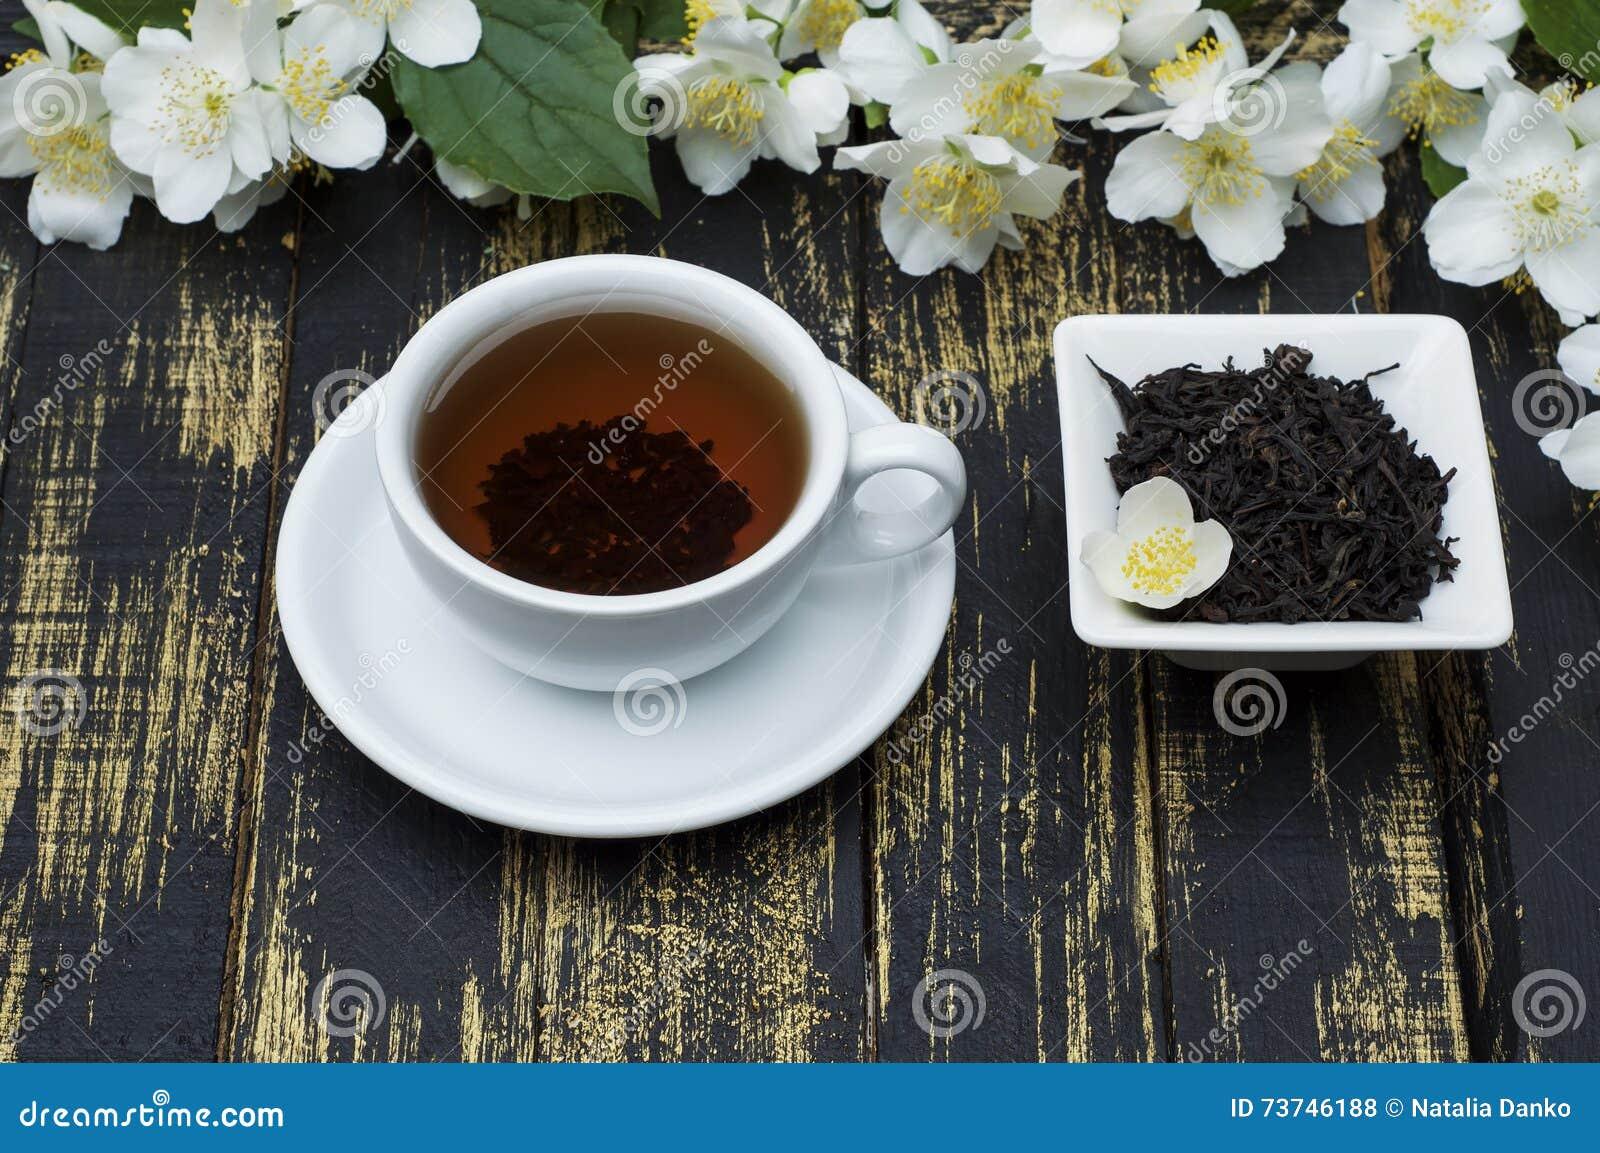 Jasmine Tea With Jasmine Flower Stock Photo Image Of Healthy